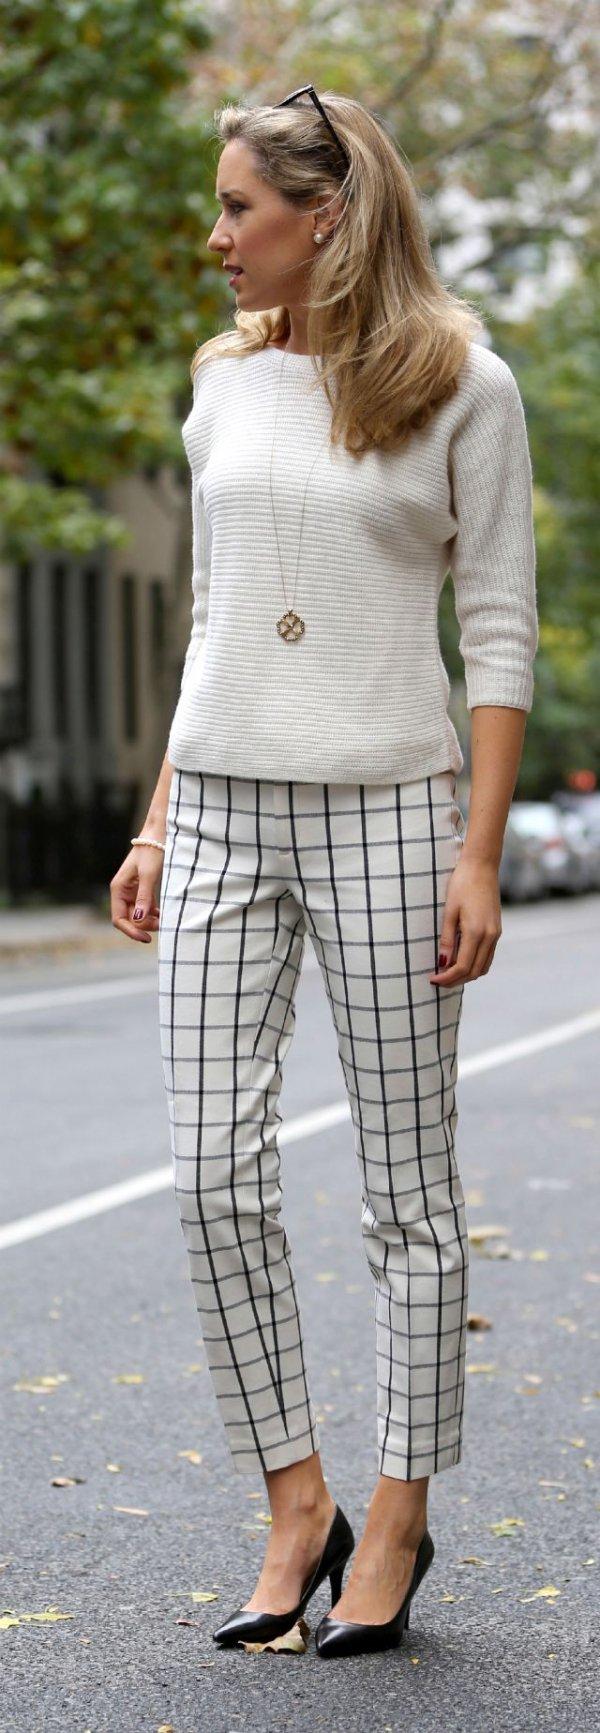 clothing,footwear,fashion,pattern,spring,